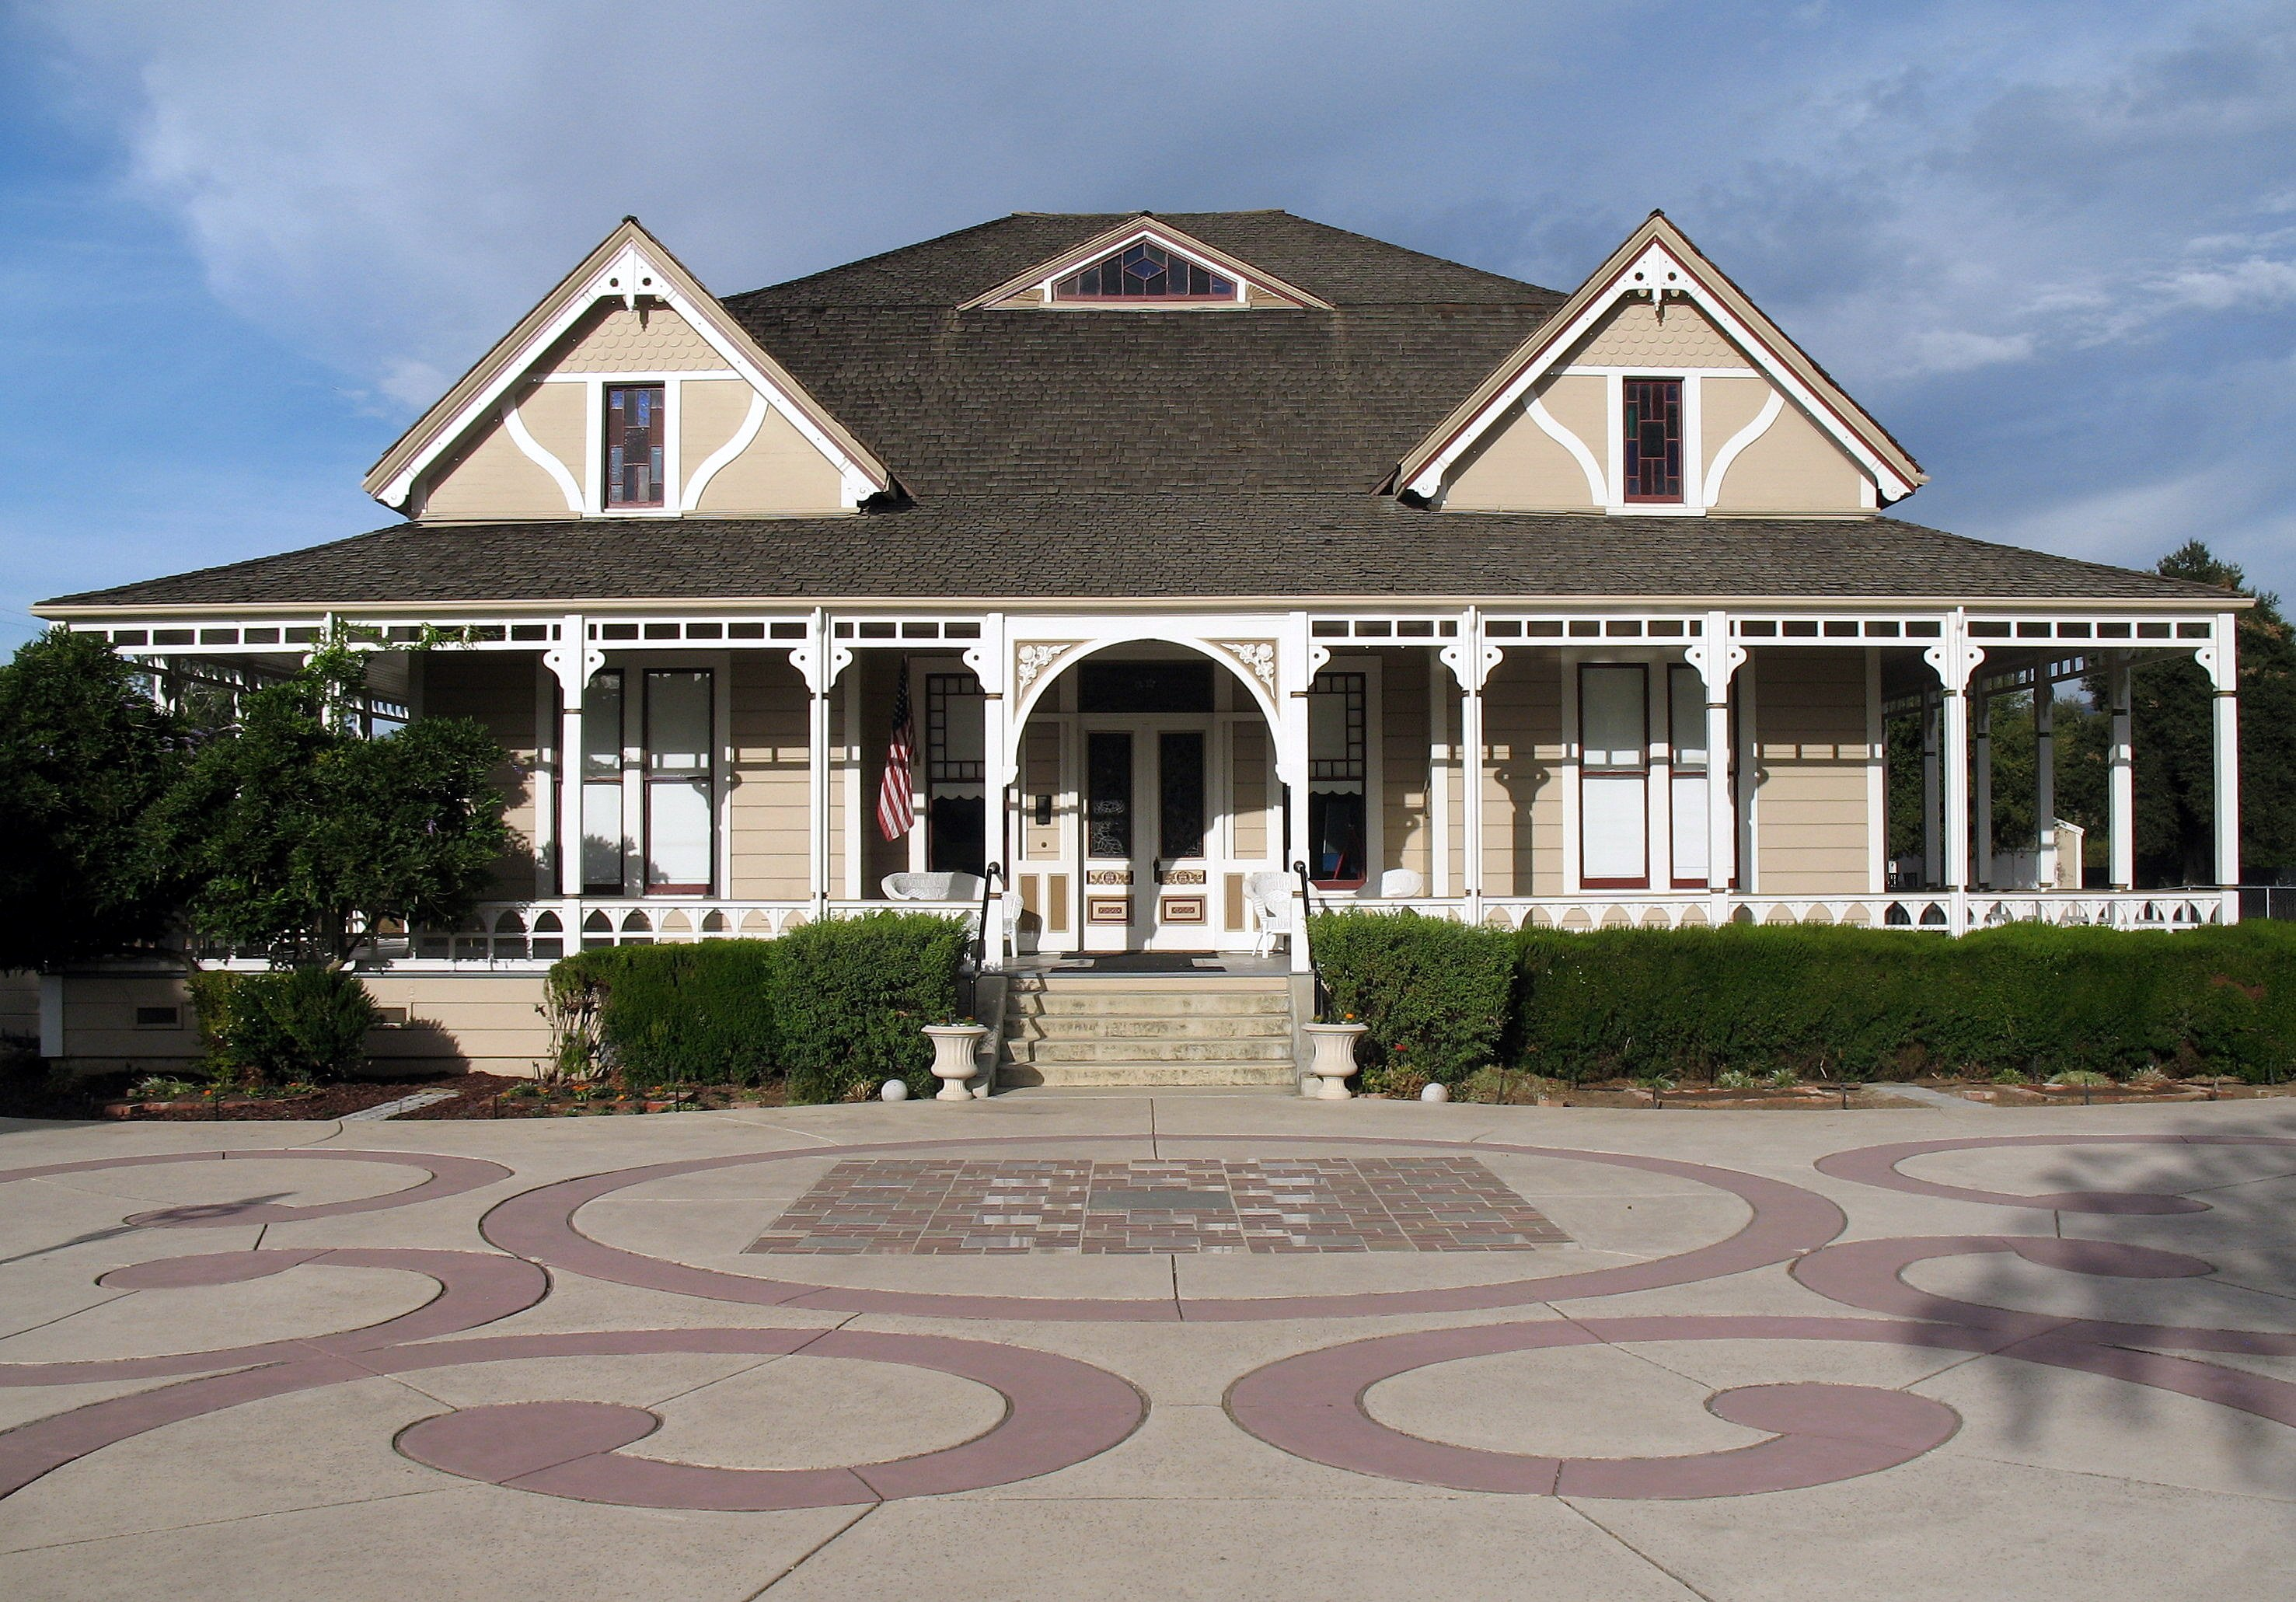 Taken 2012: Villa Mira Monte, 17860 Monterey St., Morgan Hill, California